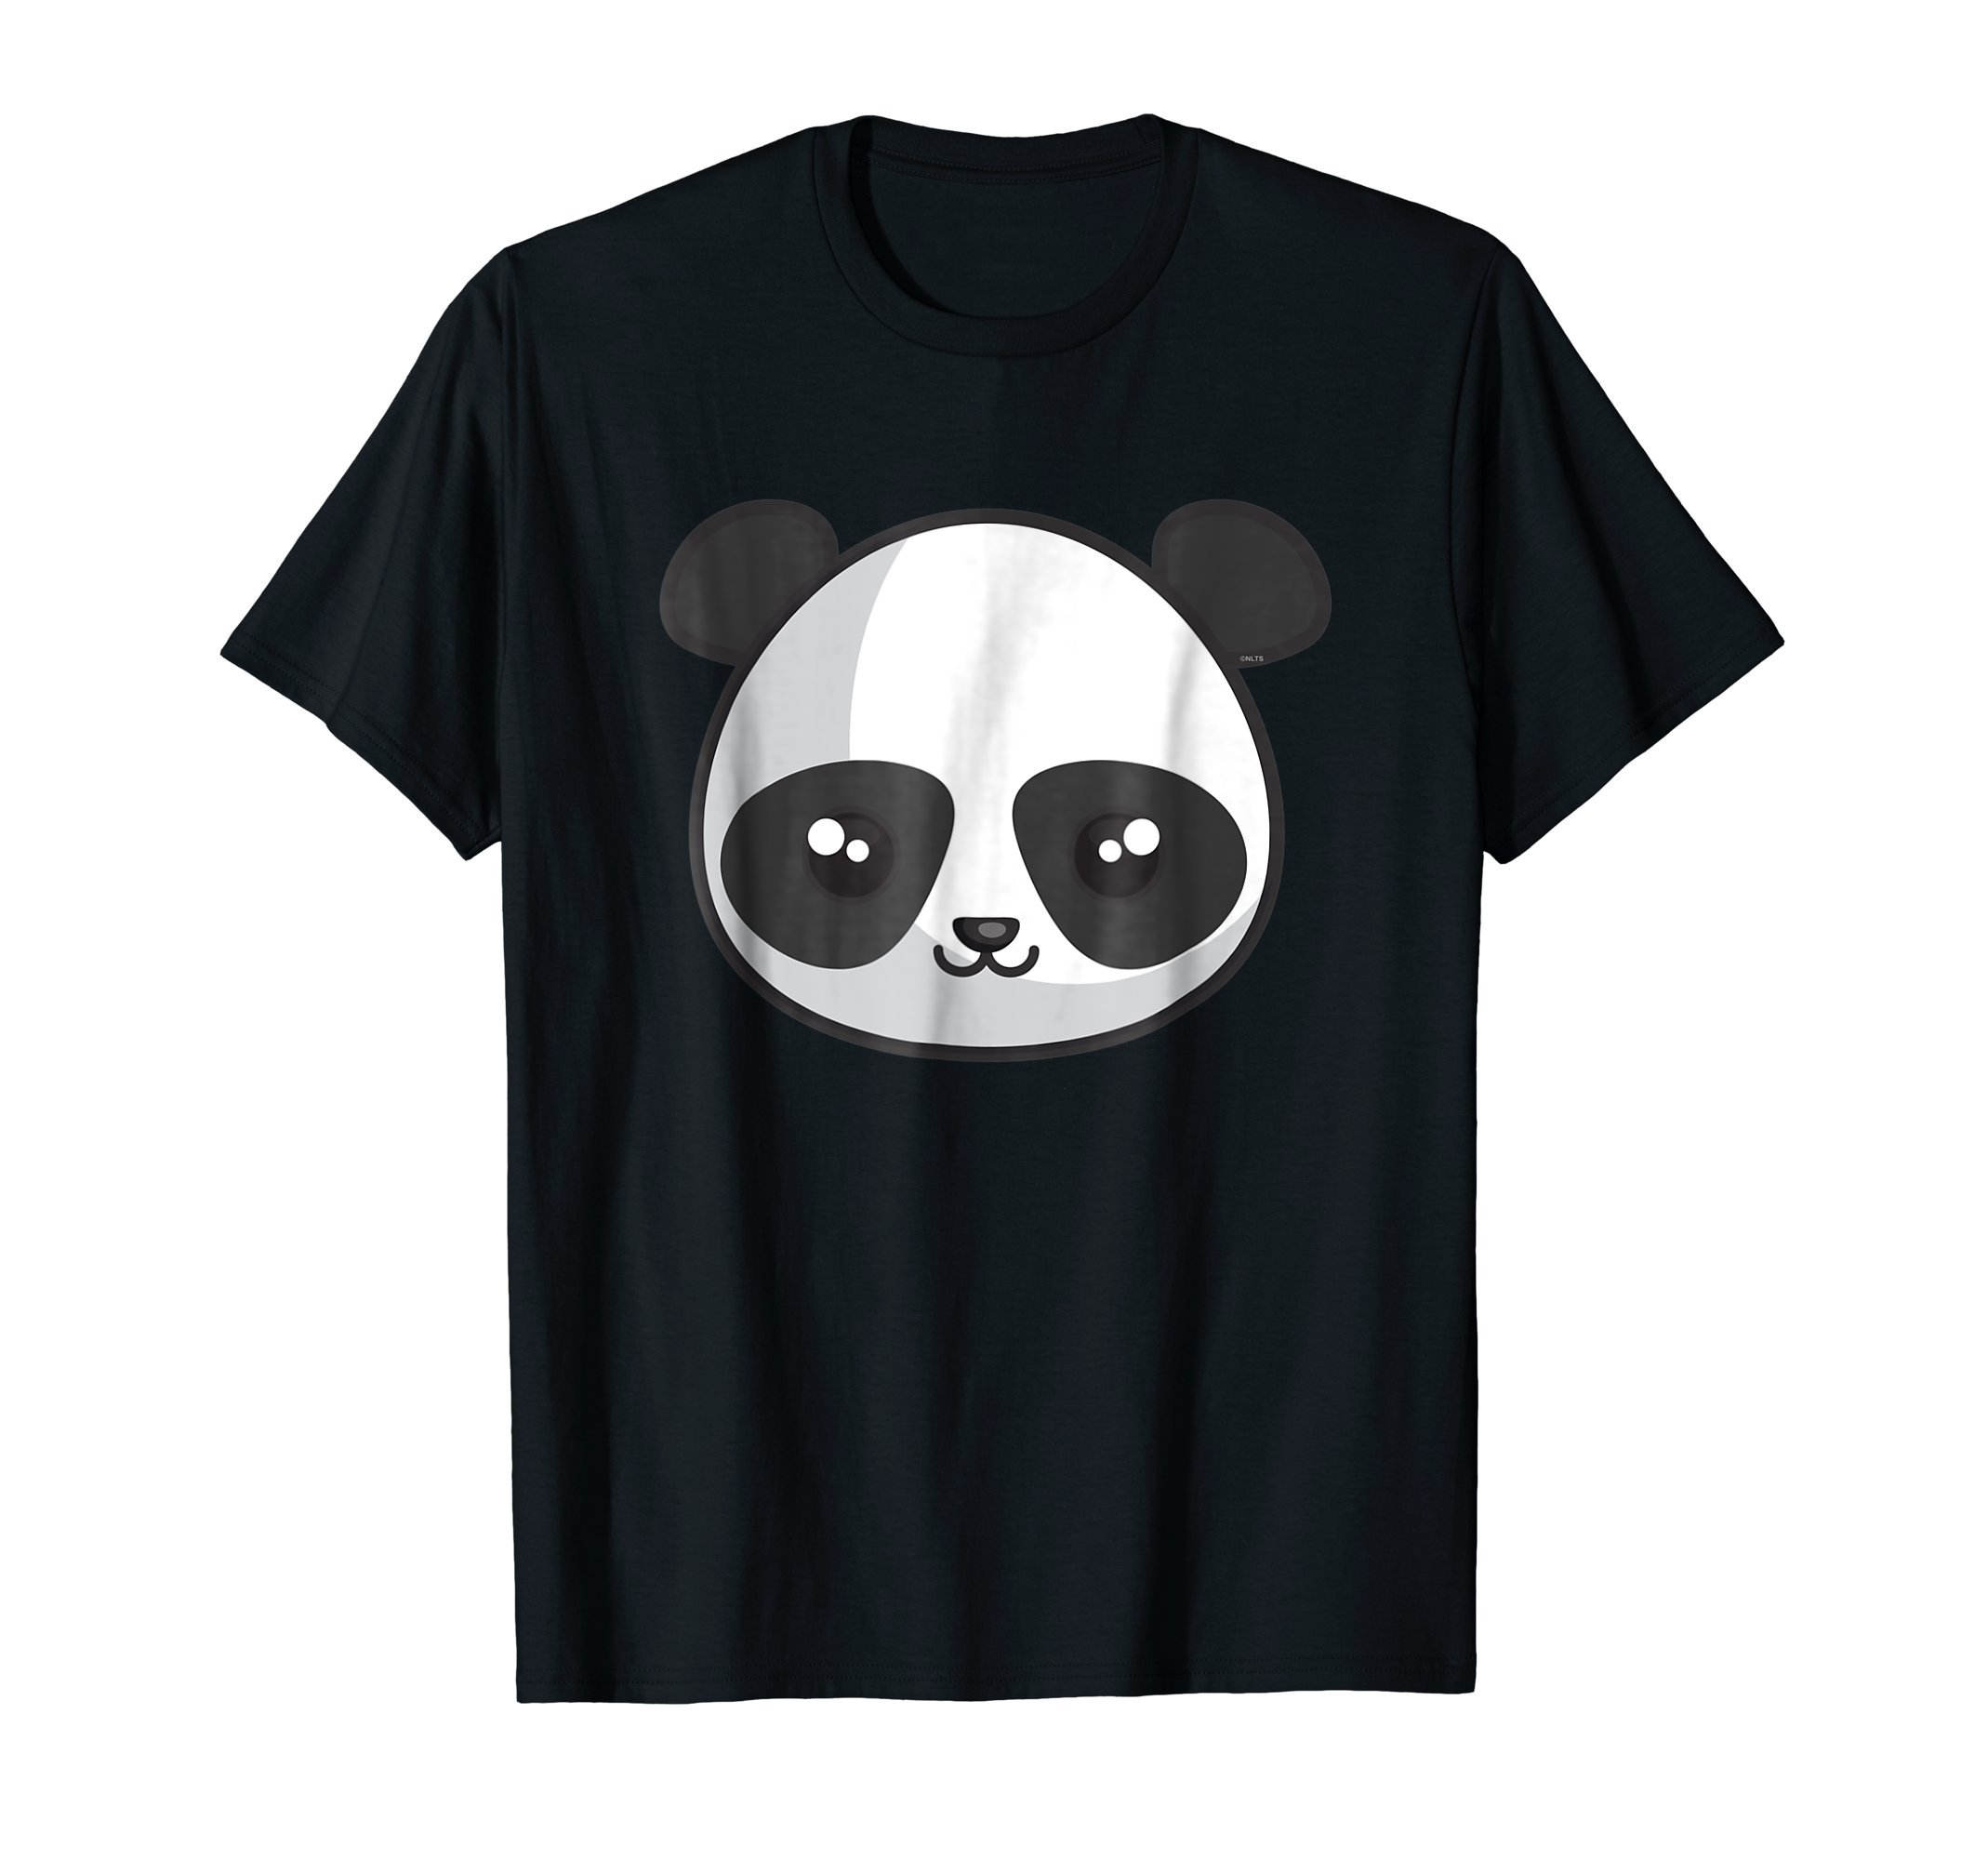 Panda-Face-Halloween-Fun-costume-T-Shirt-Tee-Gift